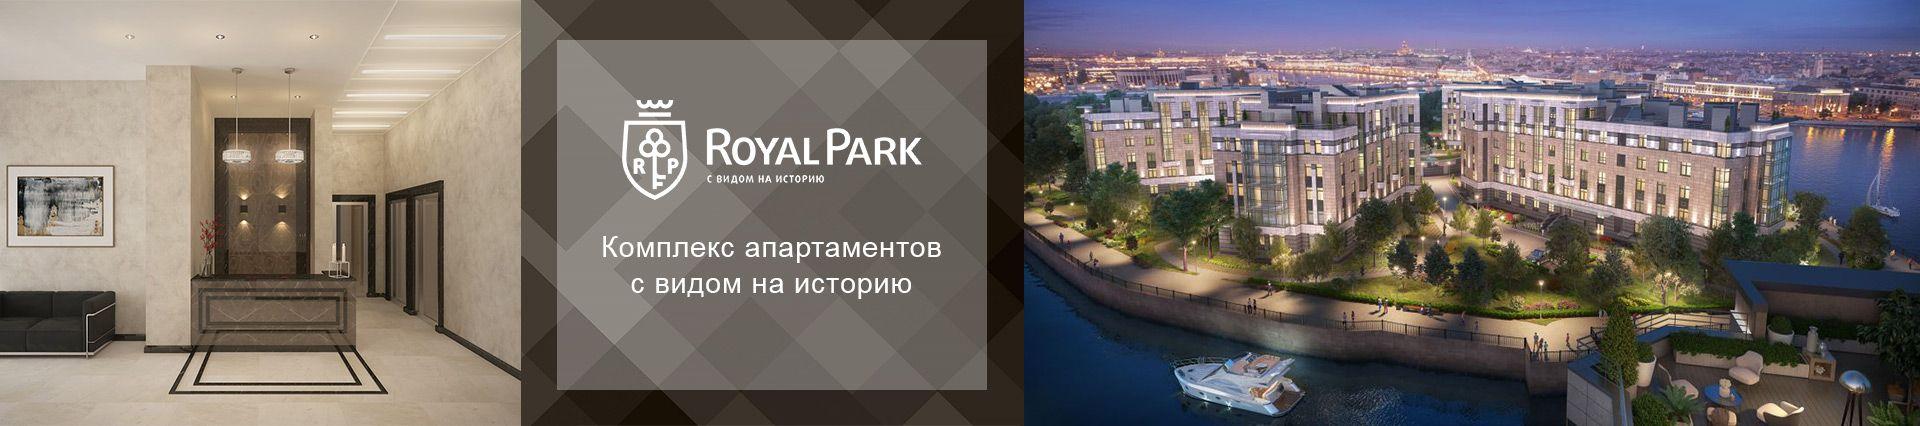 https://evspb.ru/wp-content/uploads/2018/09/royal-Park.jpg